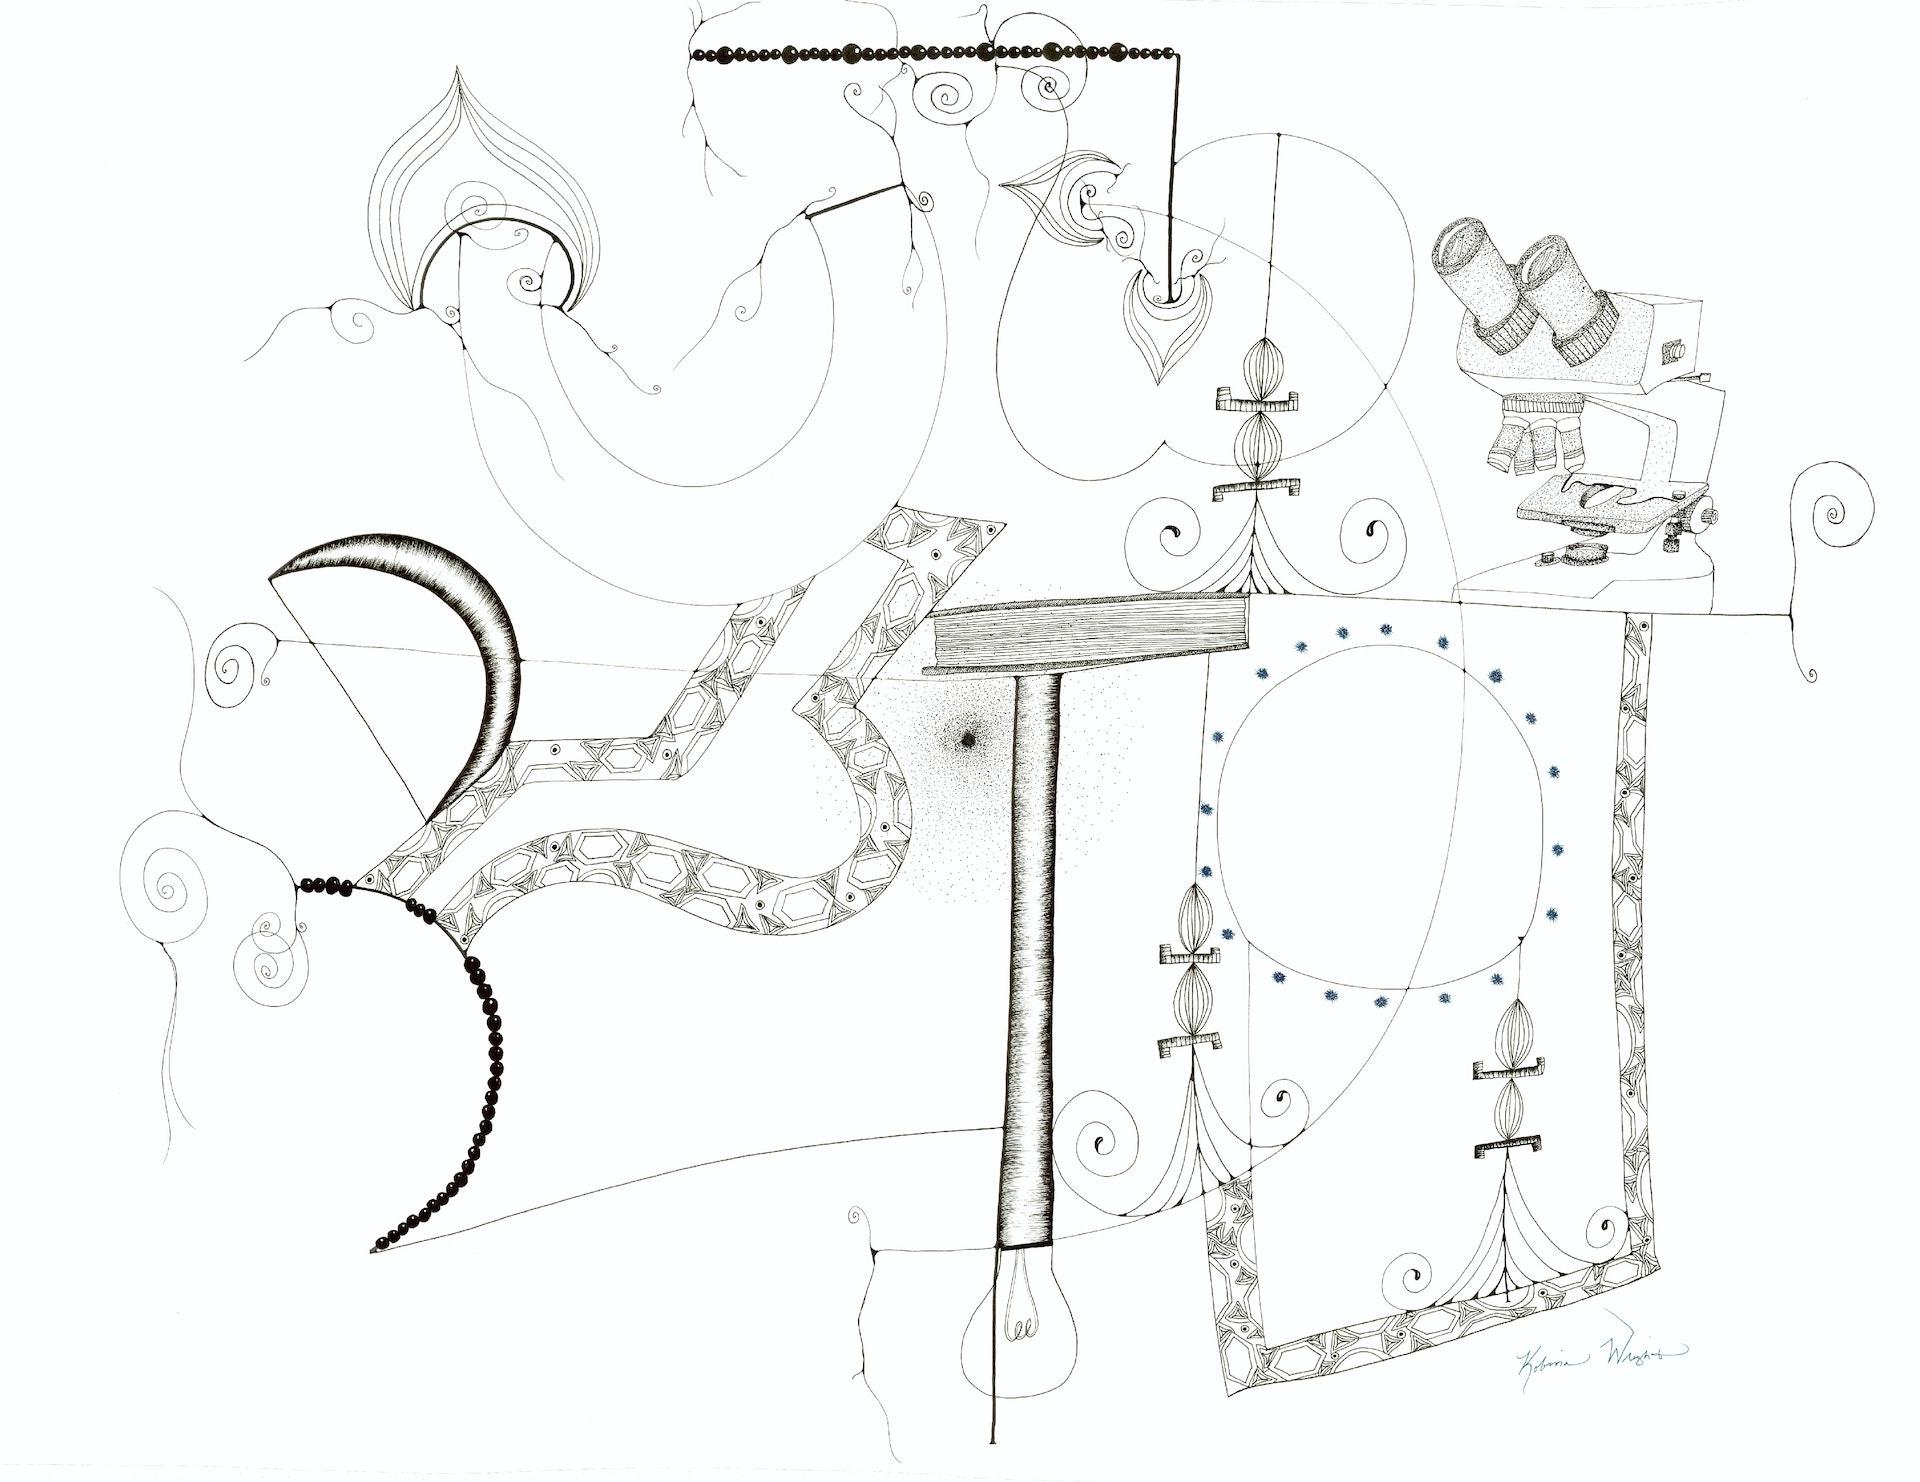 Atatiana Jefferson 2020 42 x 32.jpg